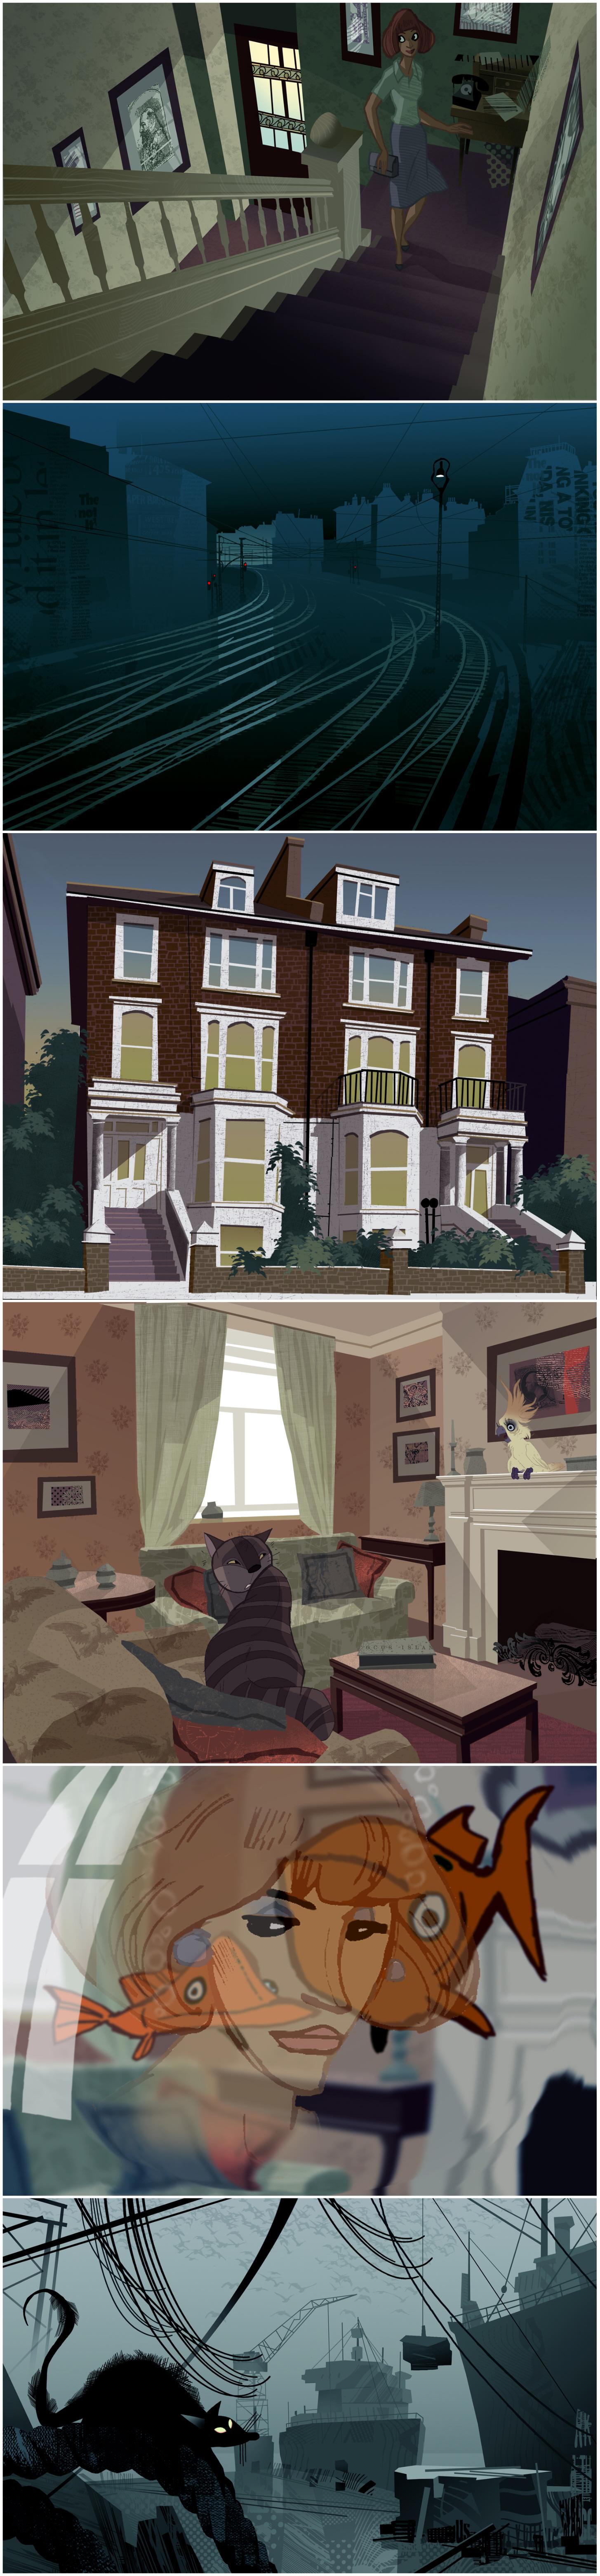 "Hans Bacher: environment concept art for abandoned Disney project ""Fraidy Cat"""